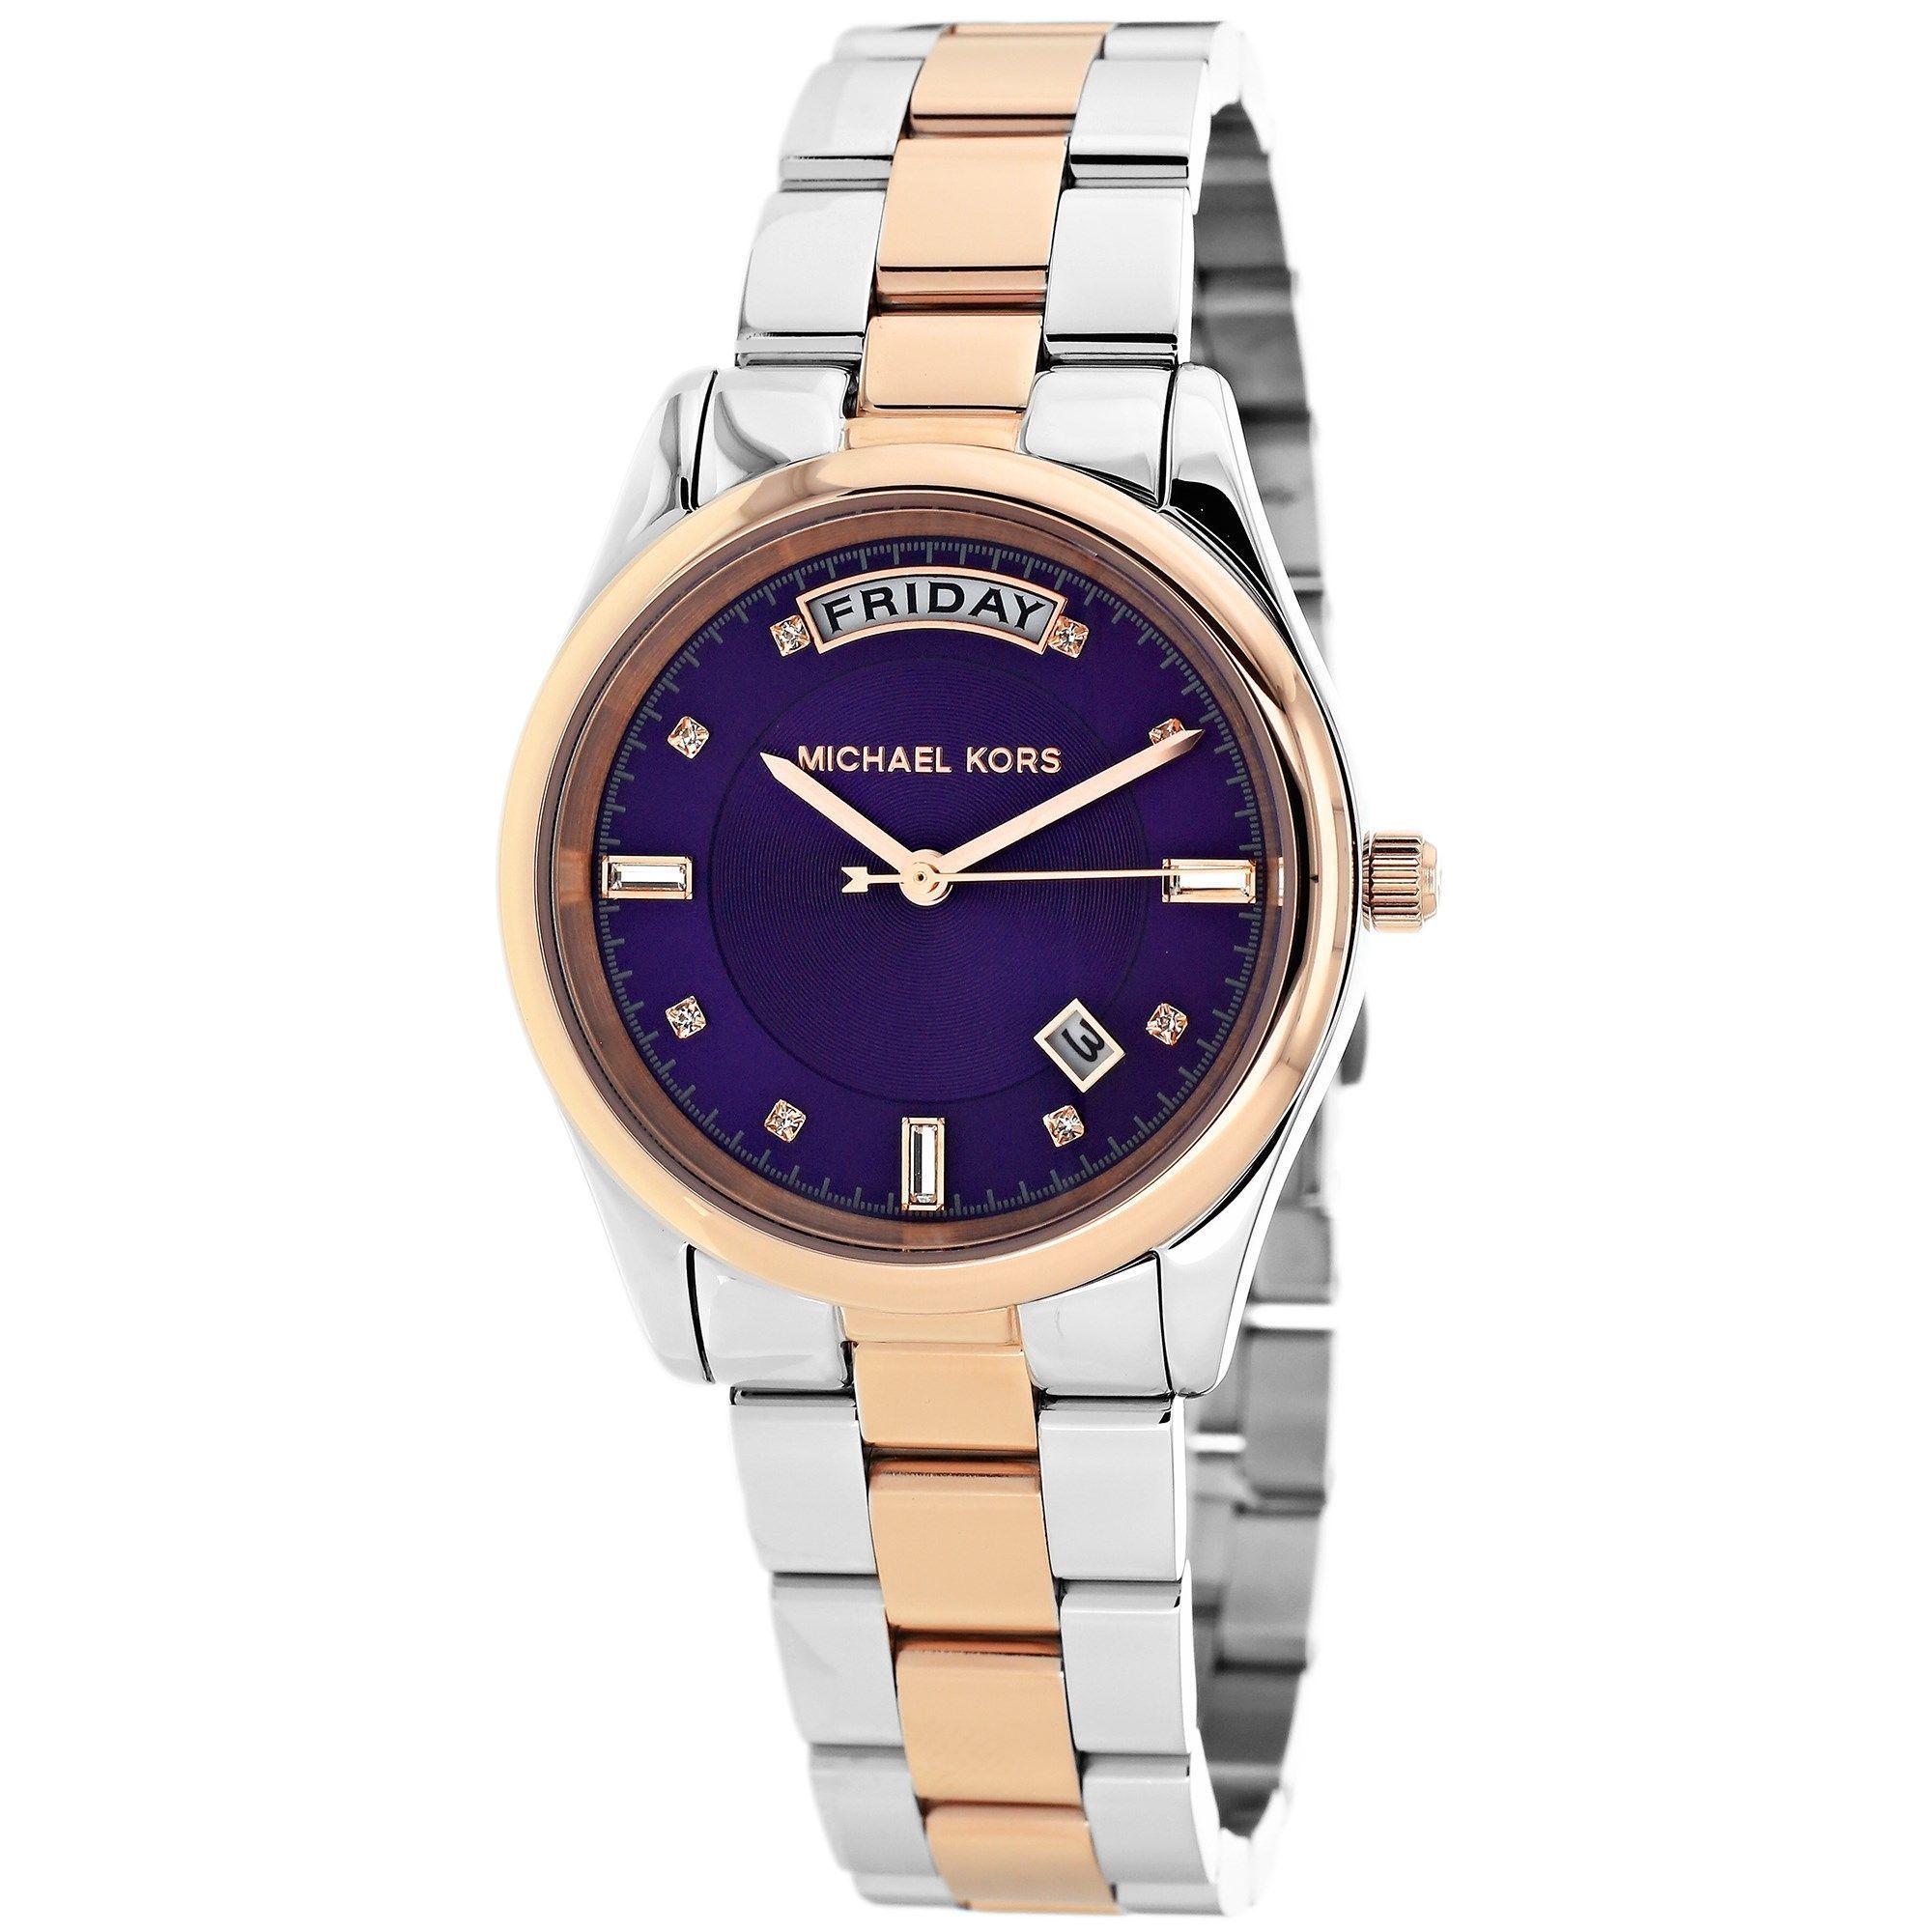 Michael Kors Women's MK6072 Colette Round Two-tone Bracelet Watch